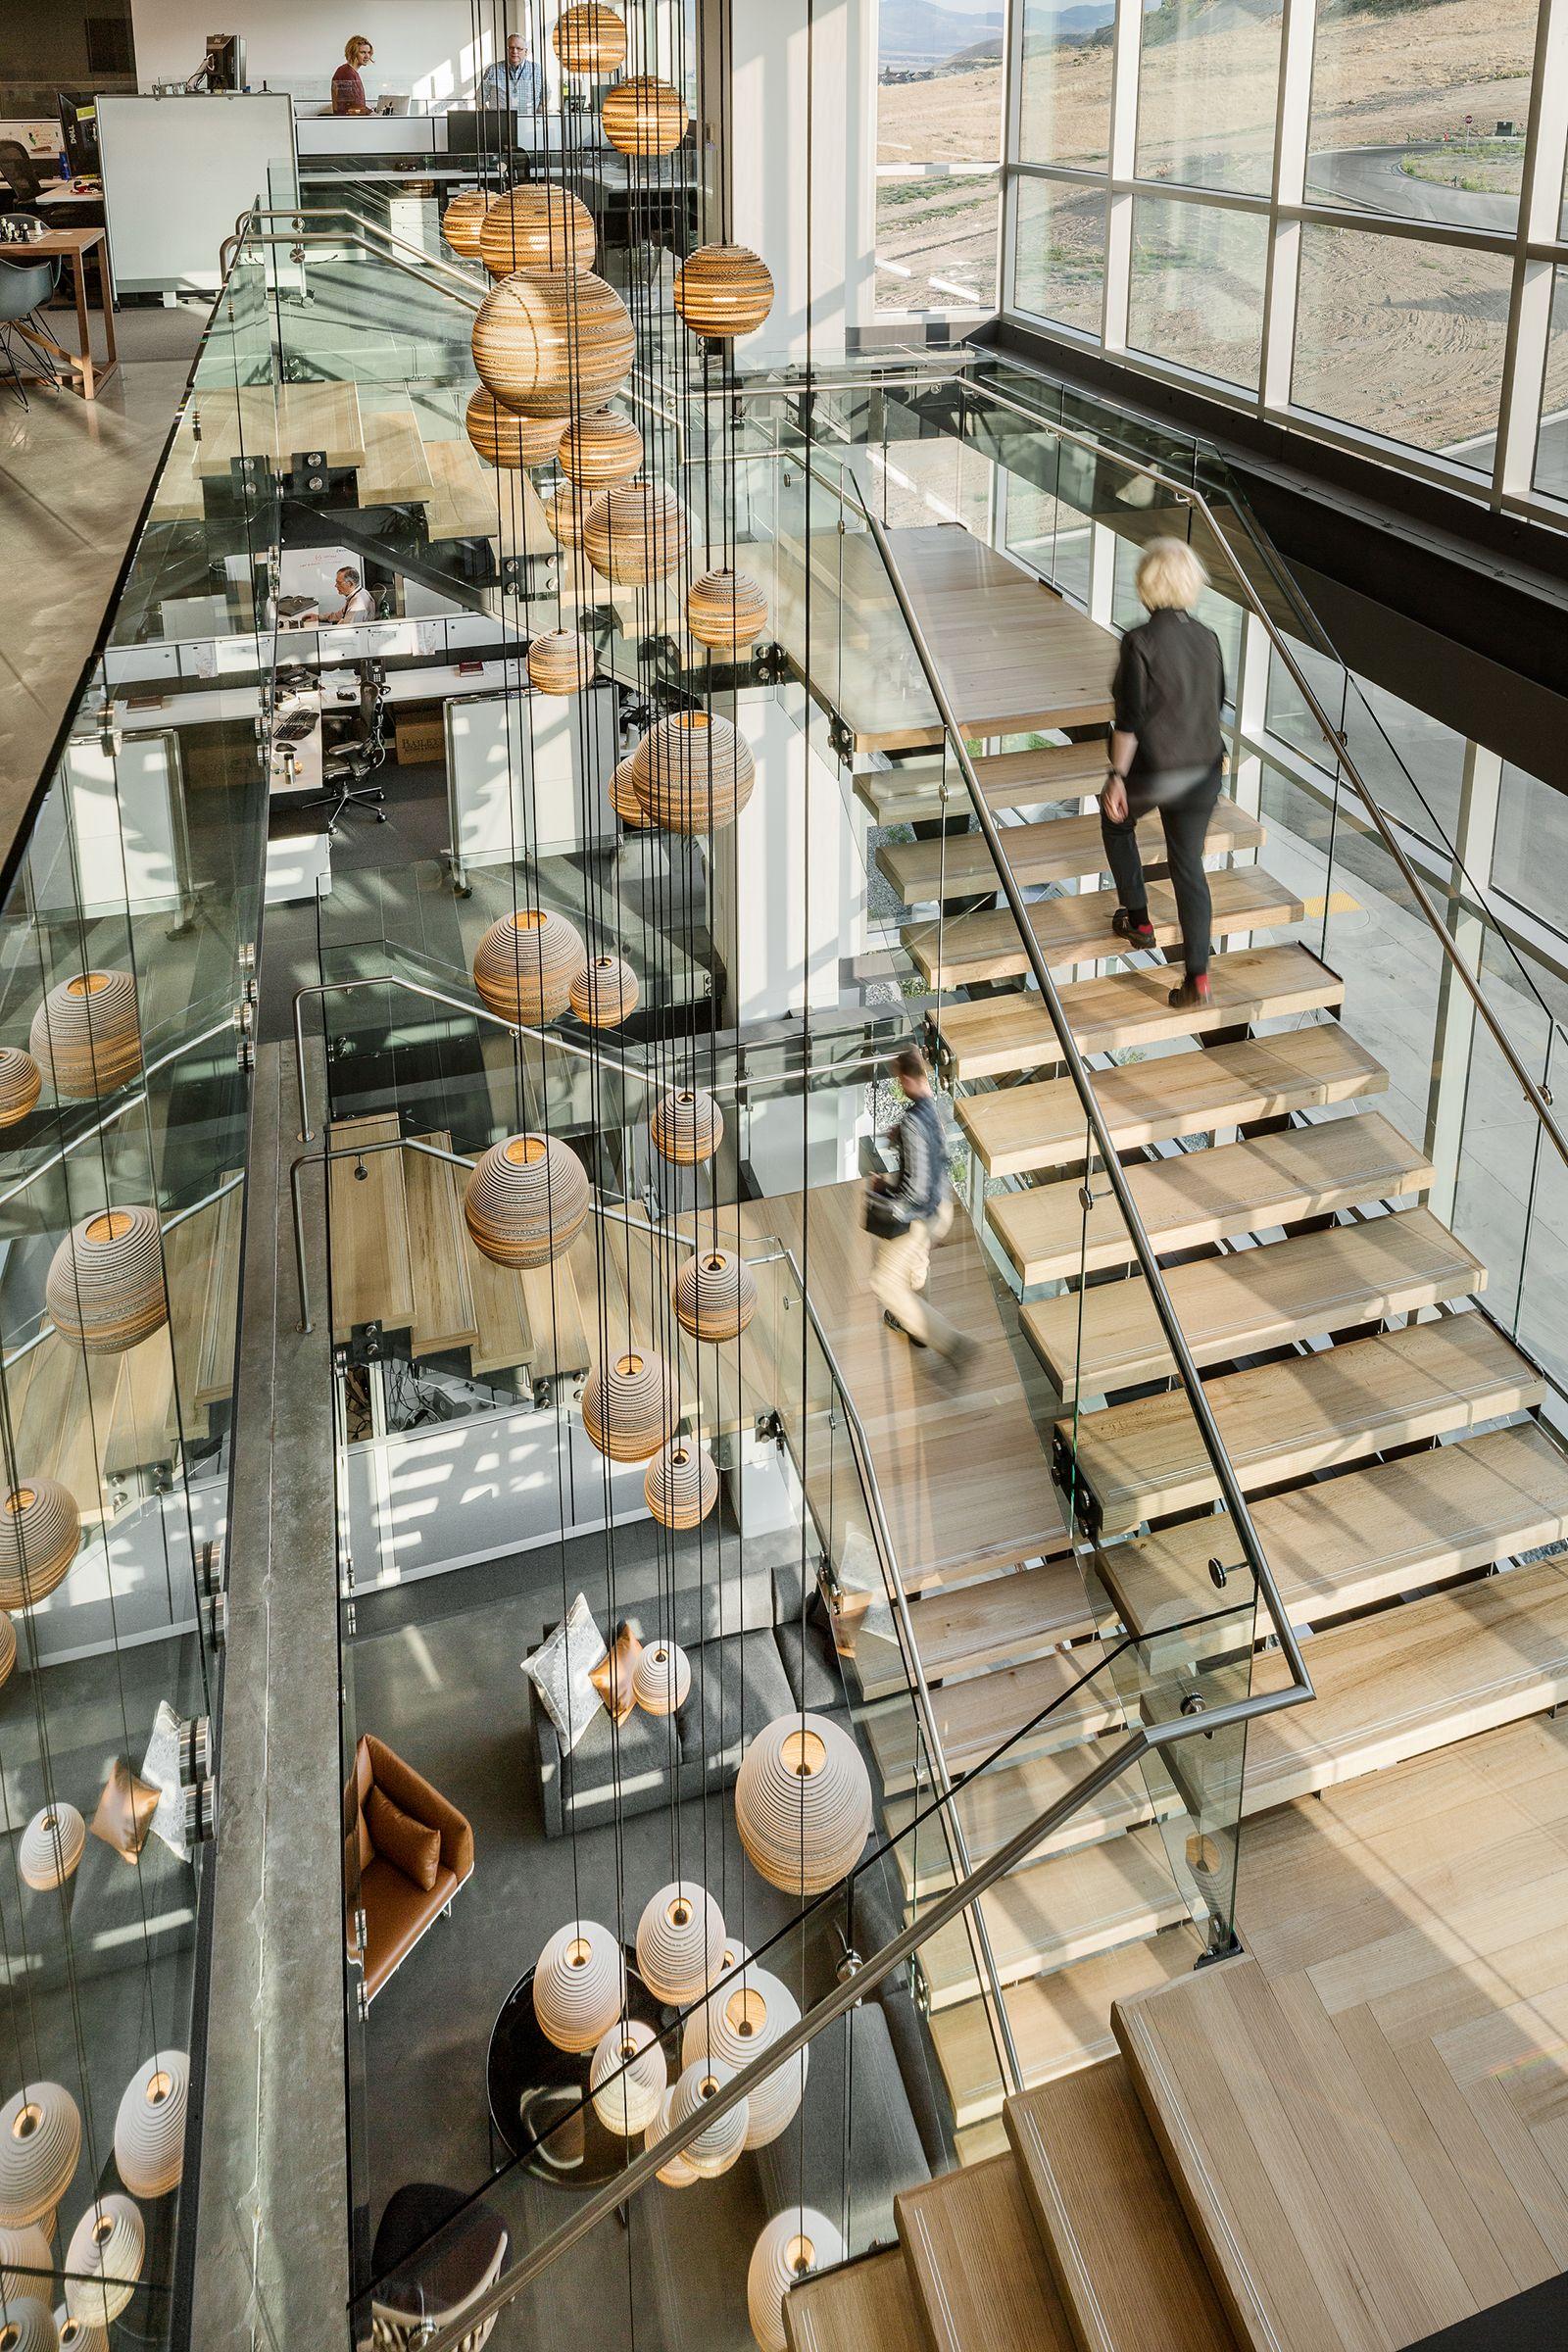 . The Ancestry office in Salt Lake City  UT incorporates multiple